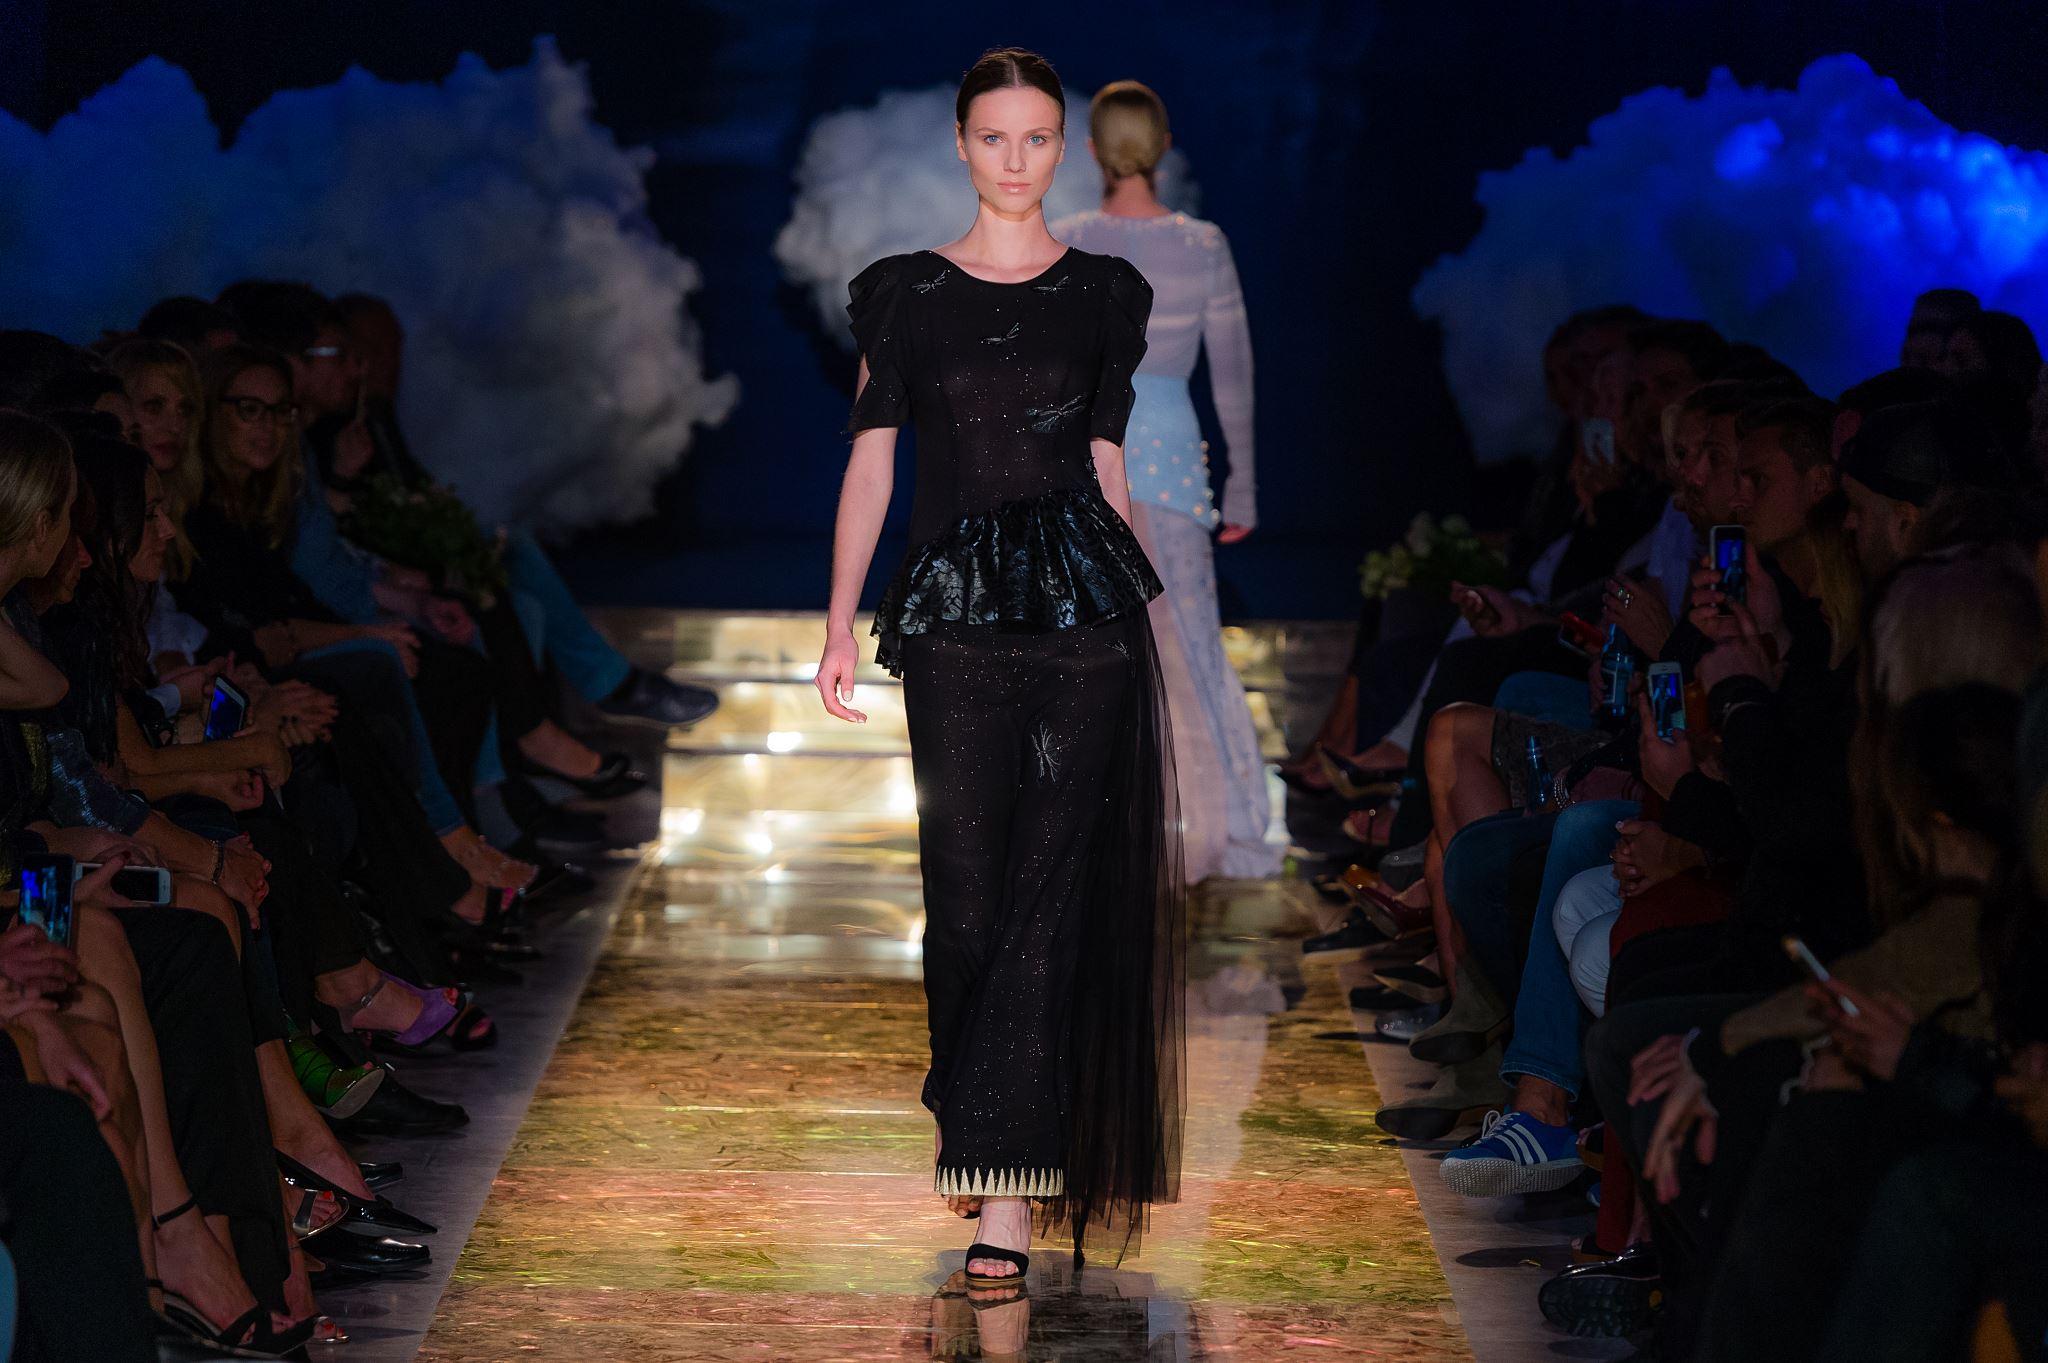 90_maciejzien_190916_web_fot_andrzej_marchwinski_fashion_images